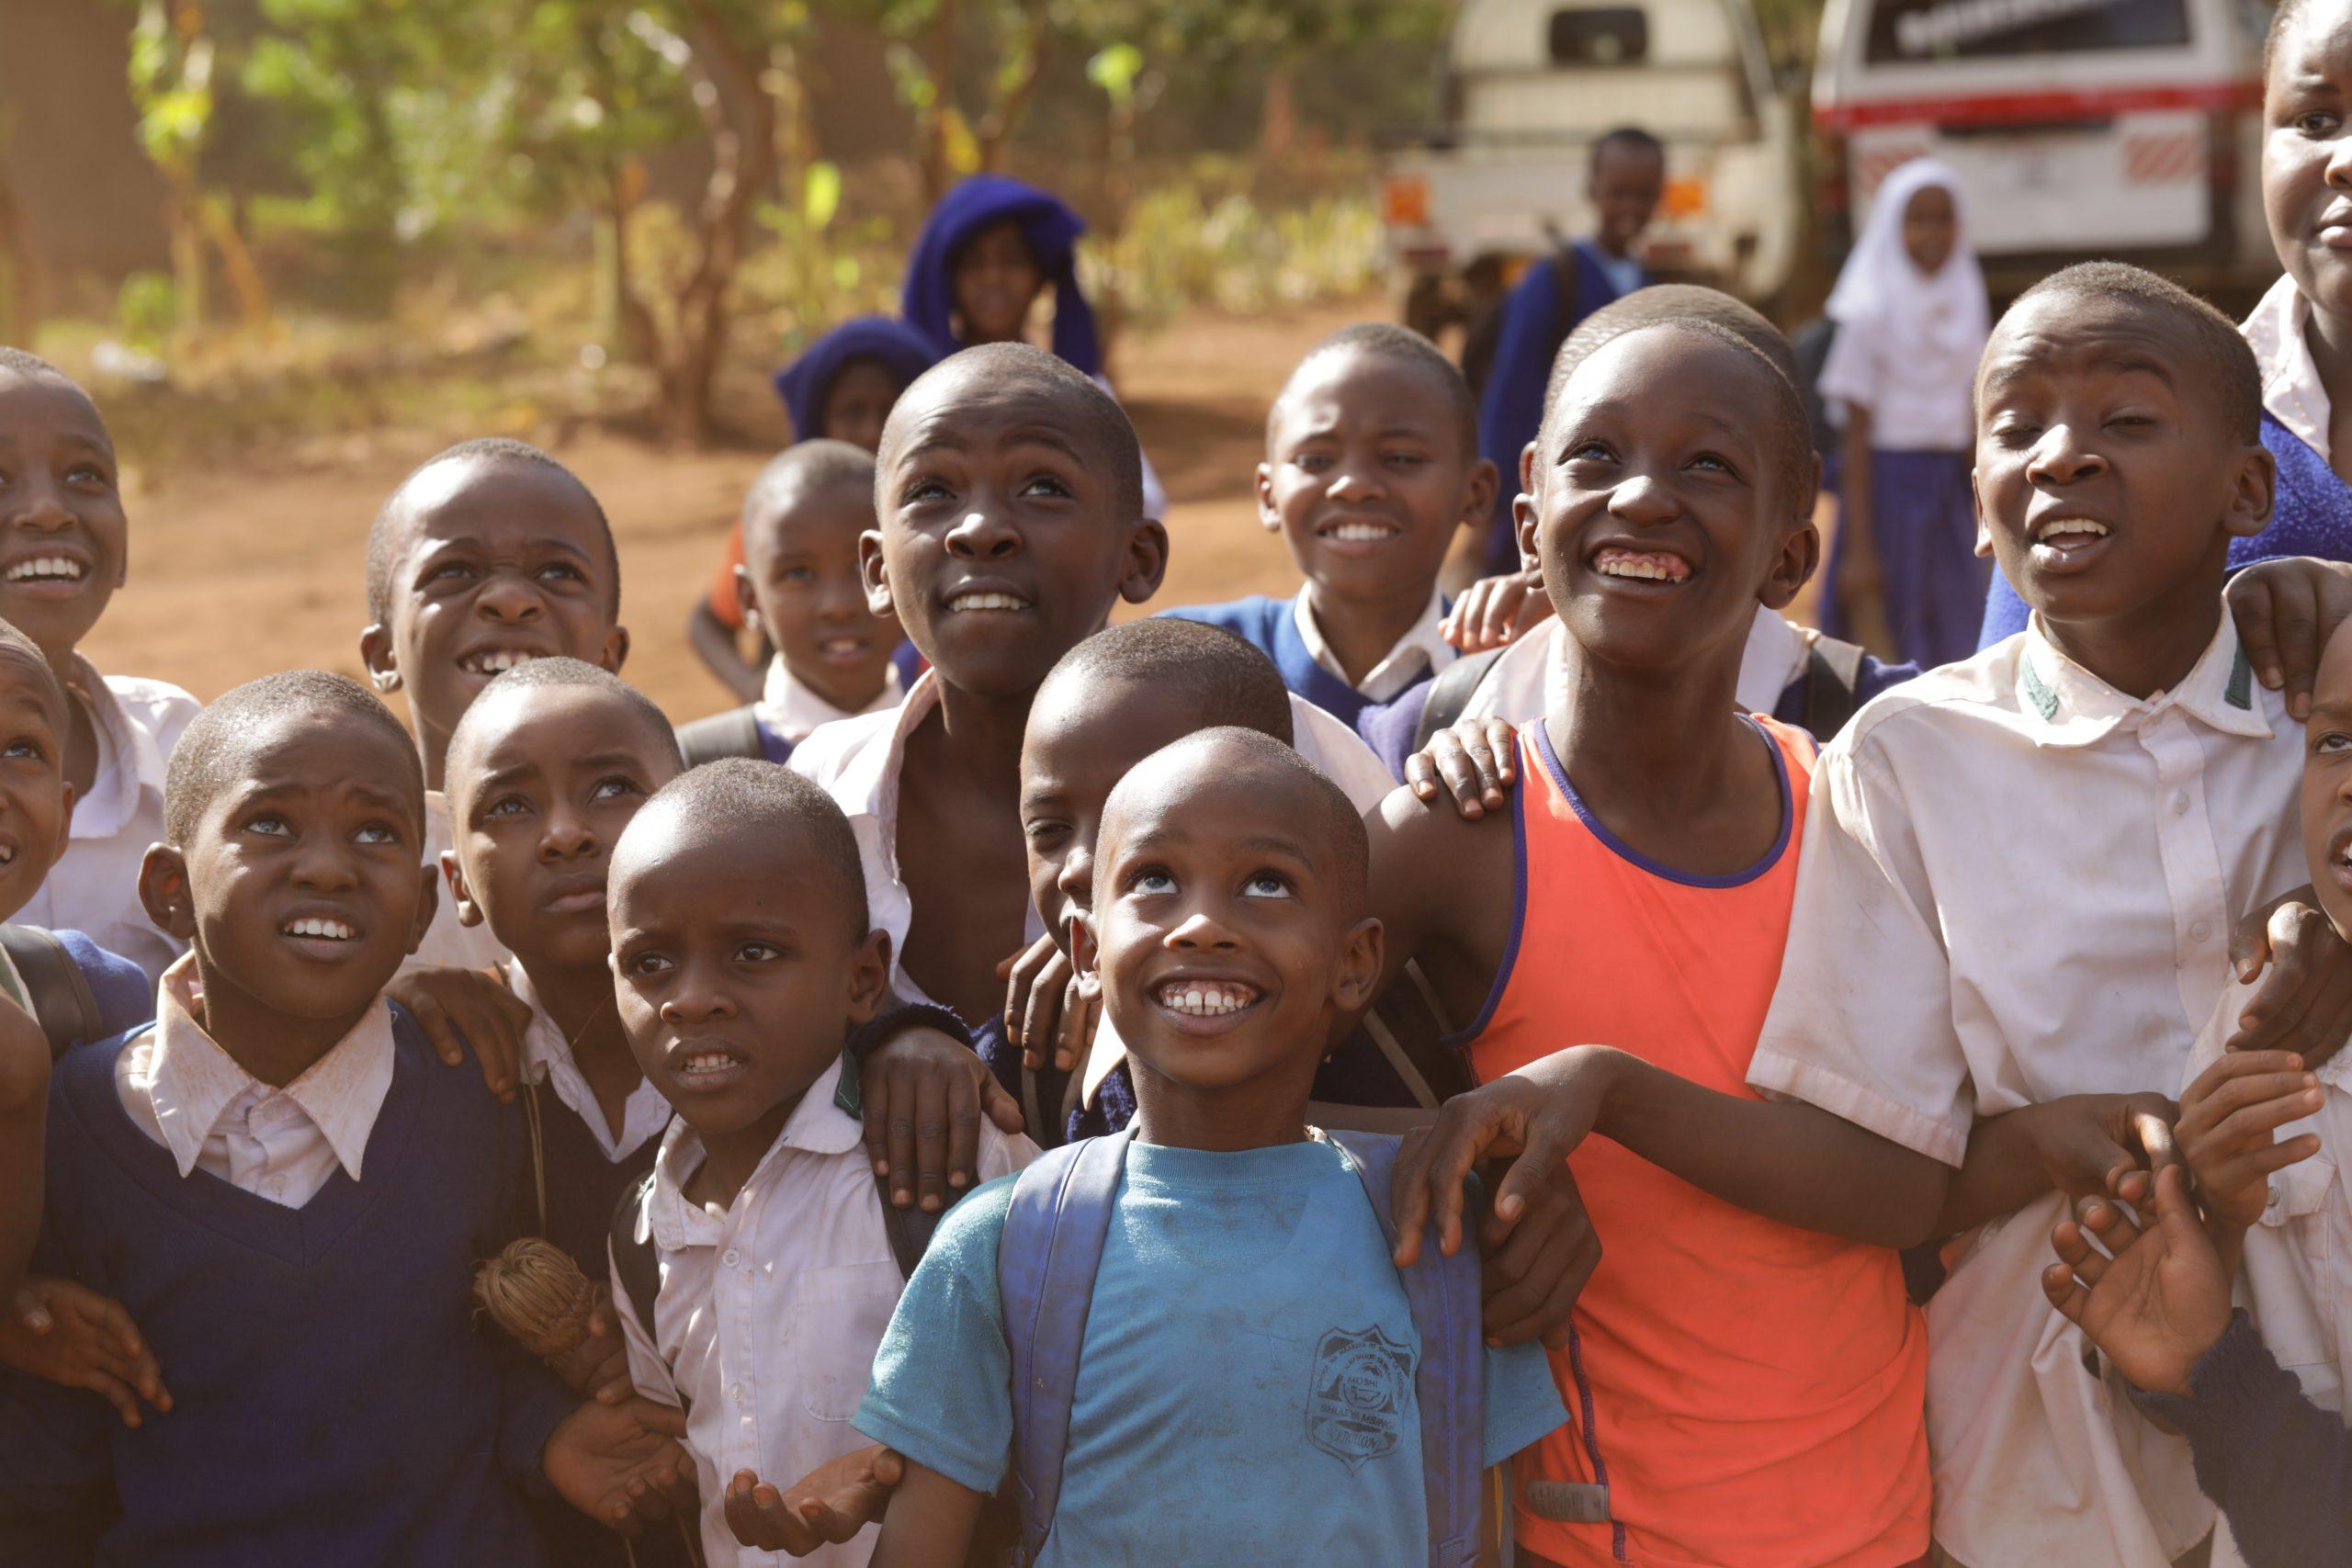 school_expedition_kenya_kilimanjaro_local_children